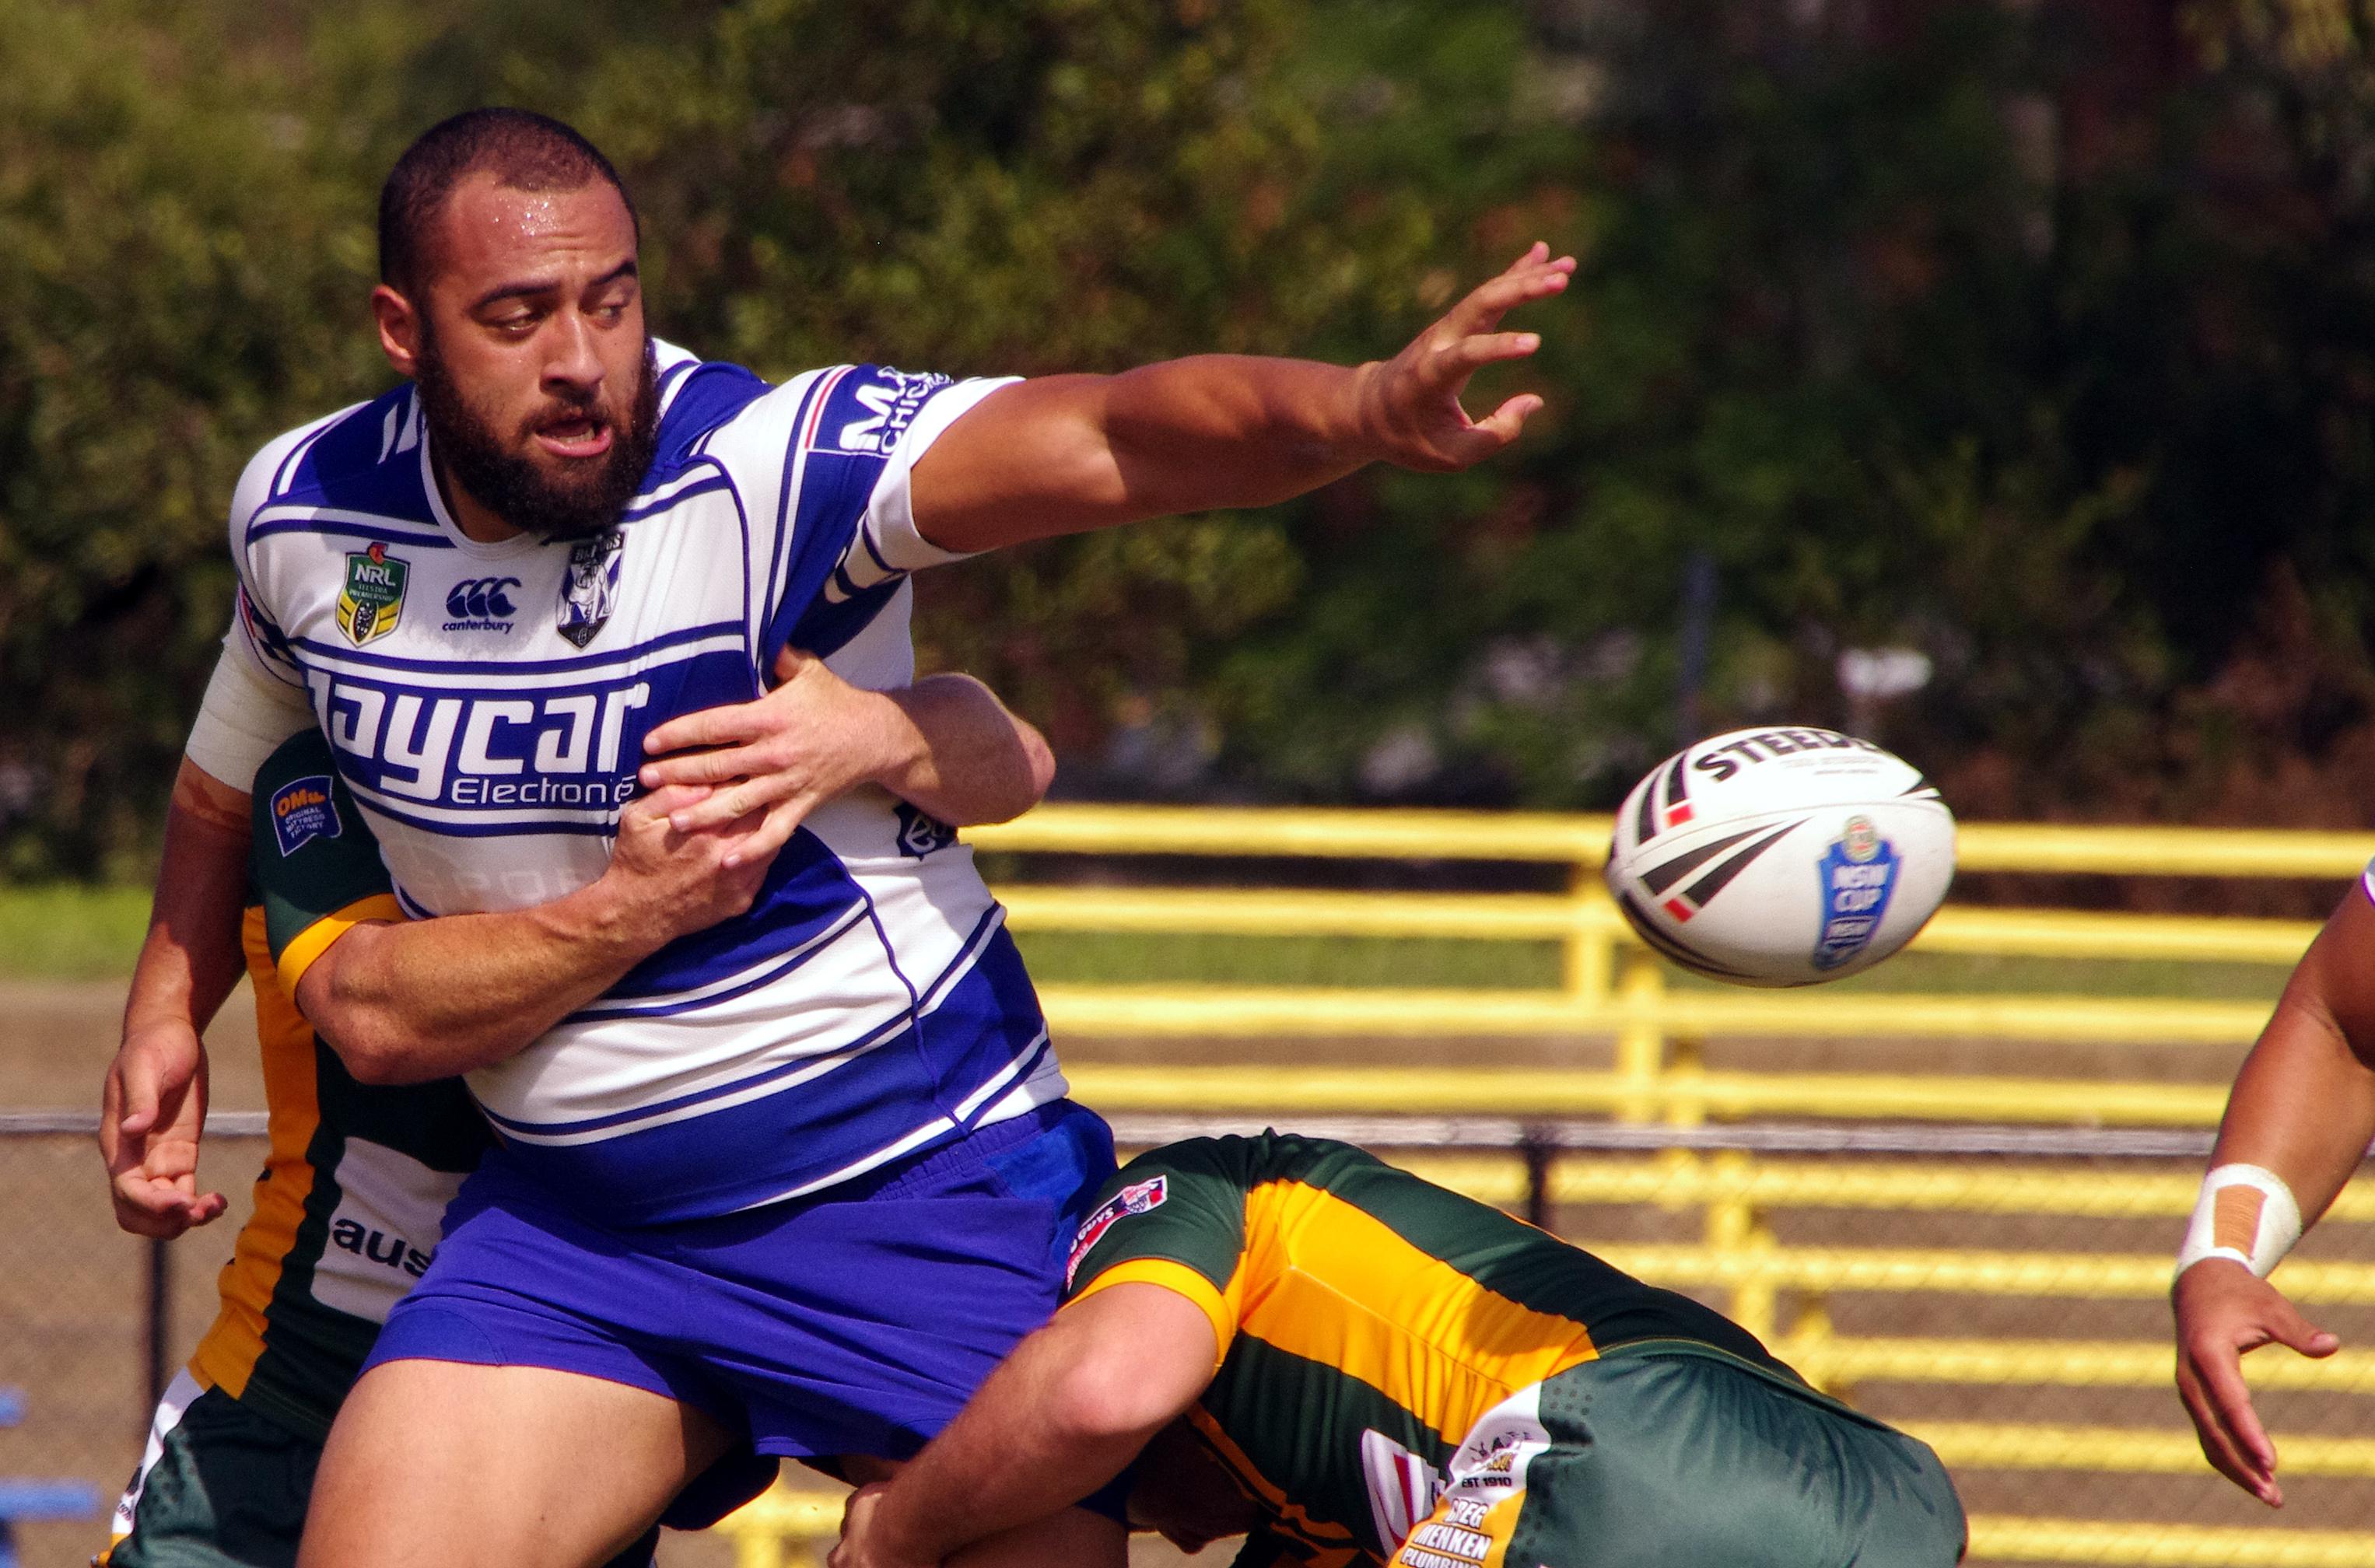 South Sydney Rabbitohs vs Canterbury Bulldogs betting preview